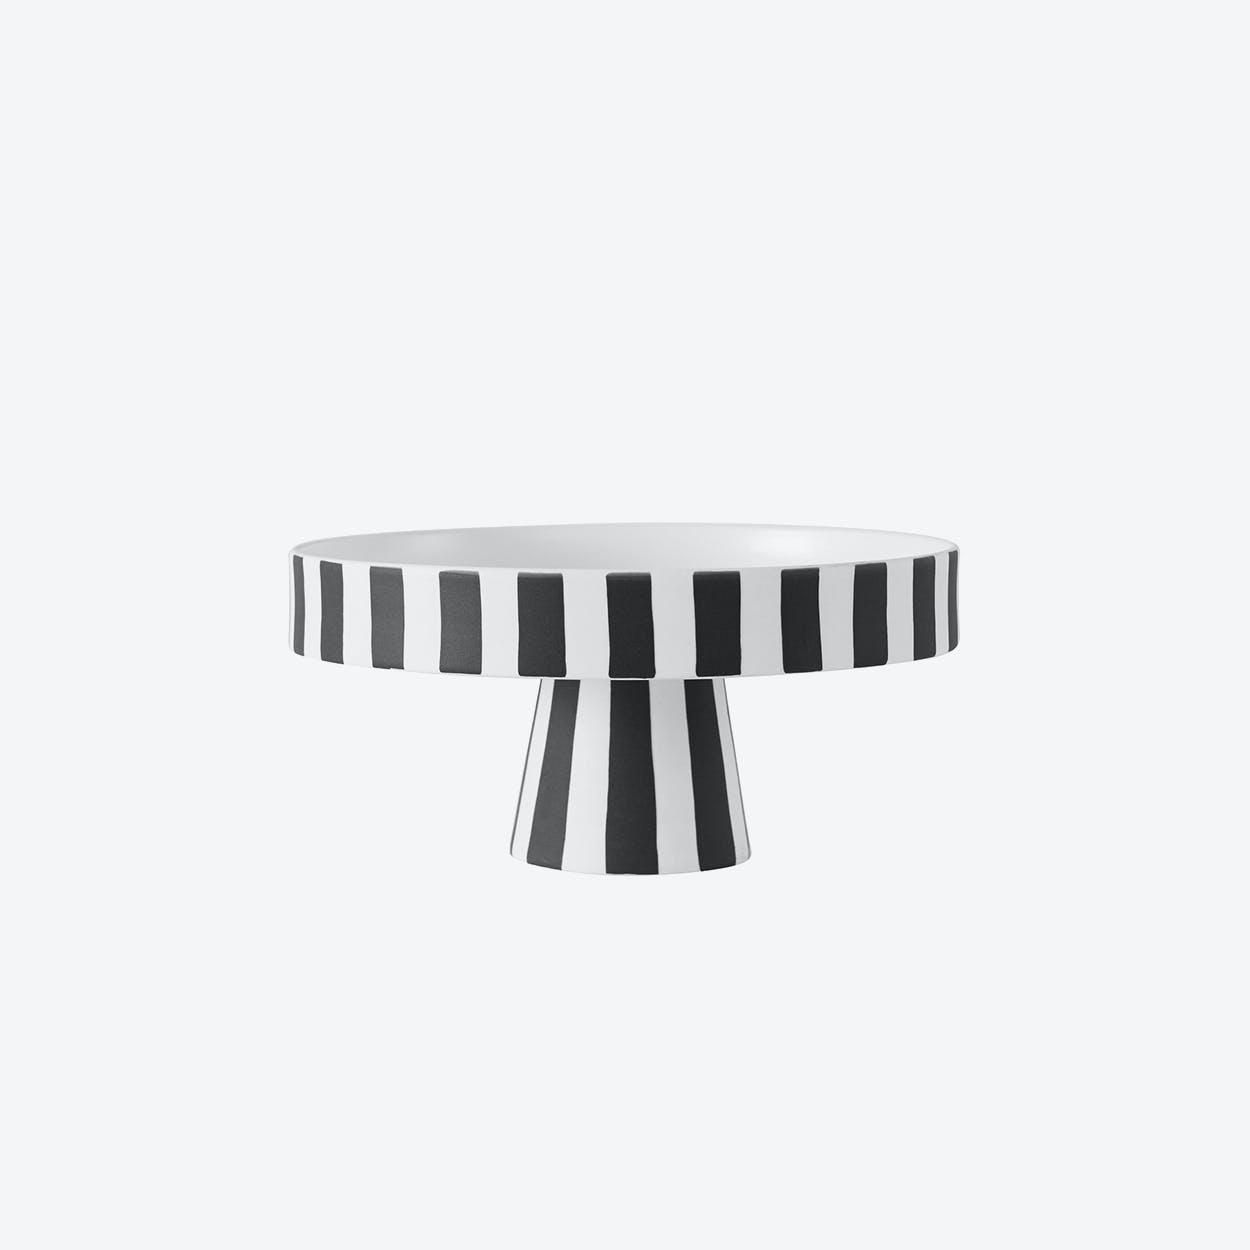 Toppu Tray in Black & White